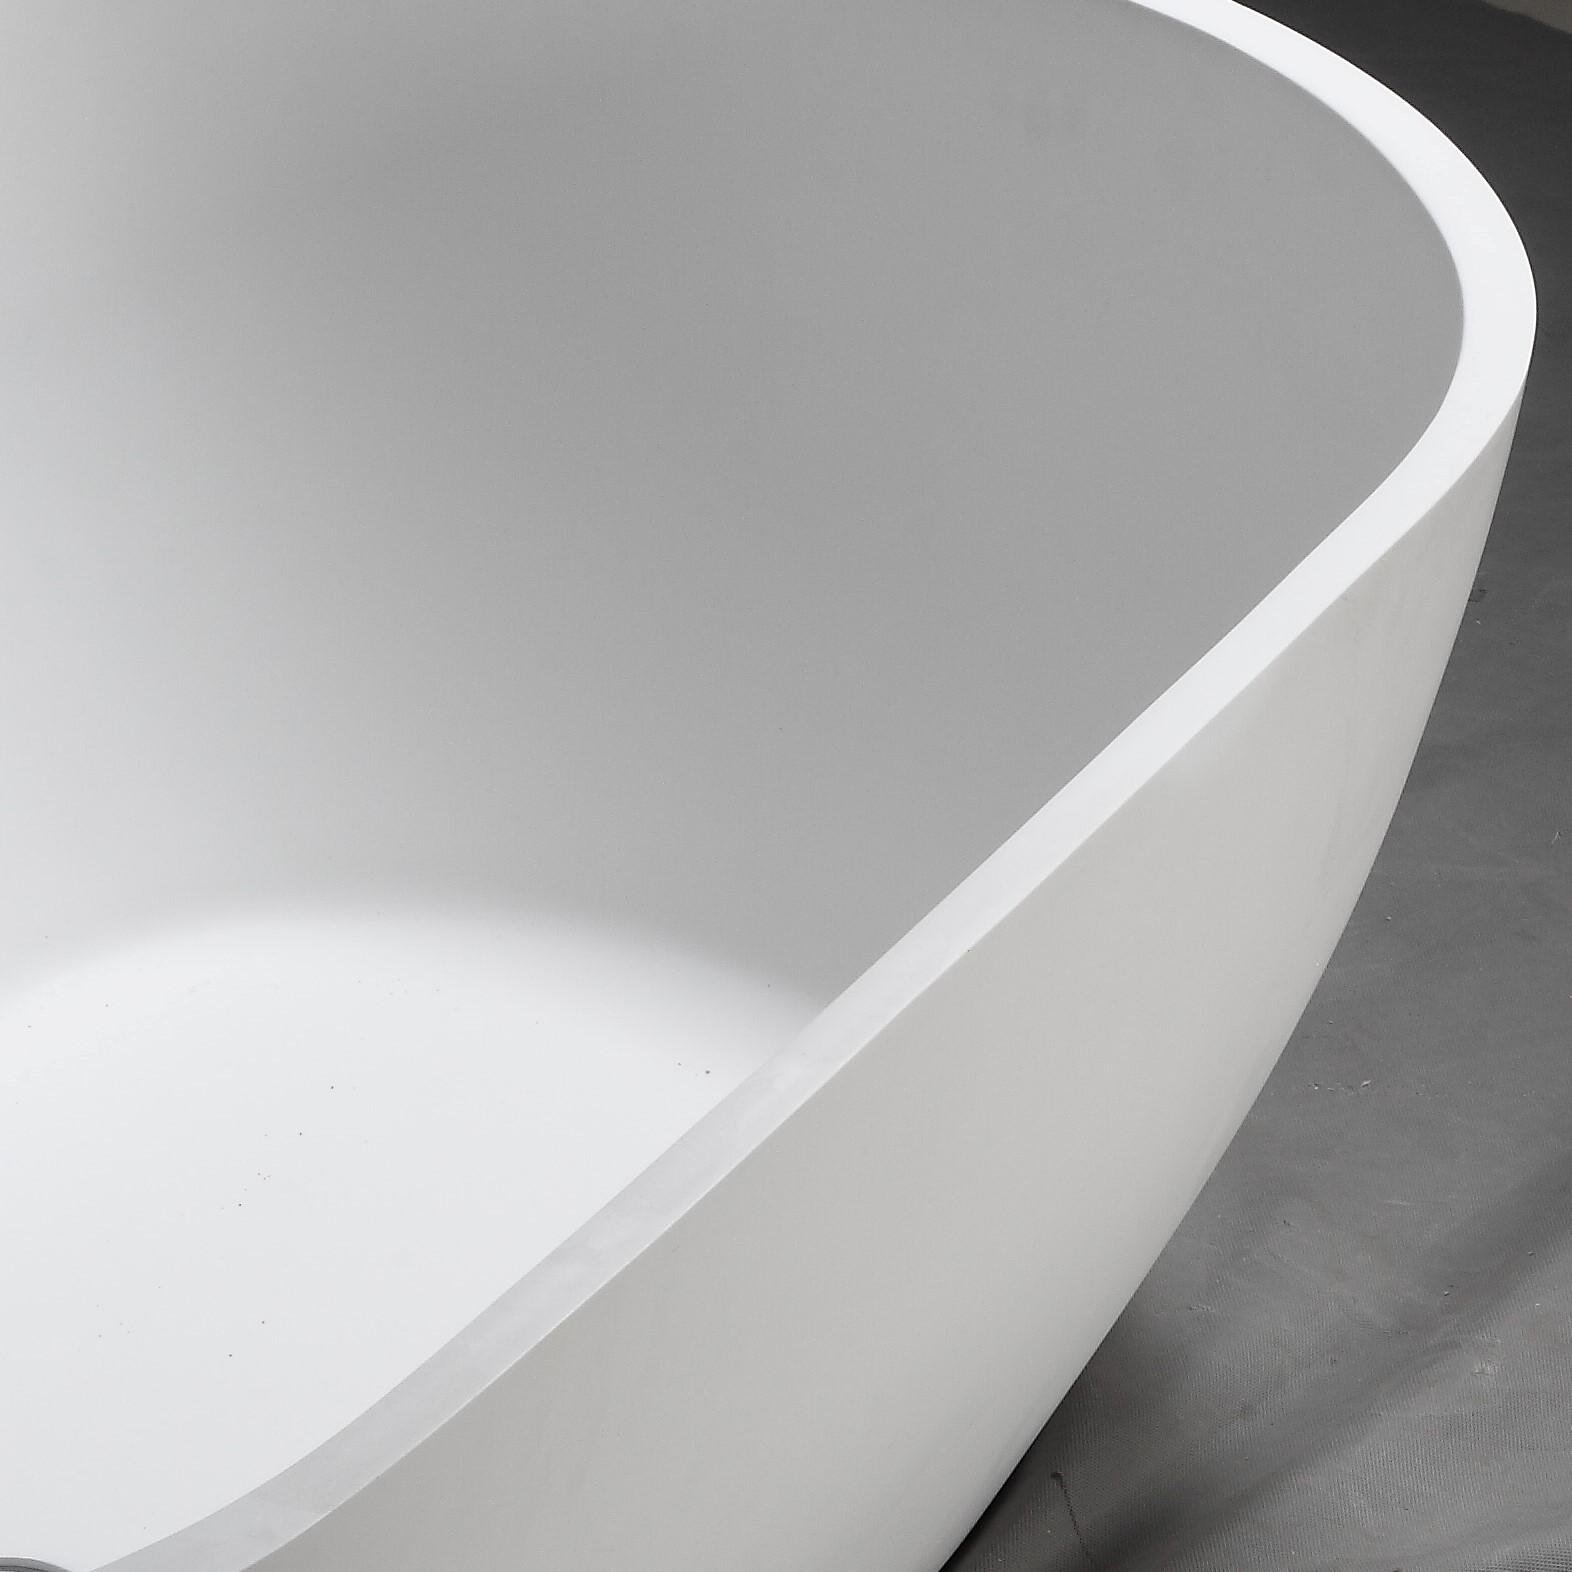 Bellissimo-Freestanding Resin Stone Cast Solid Surface Bathroom Bathtub-7